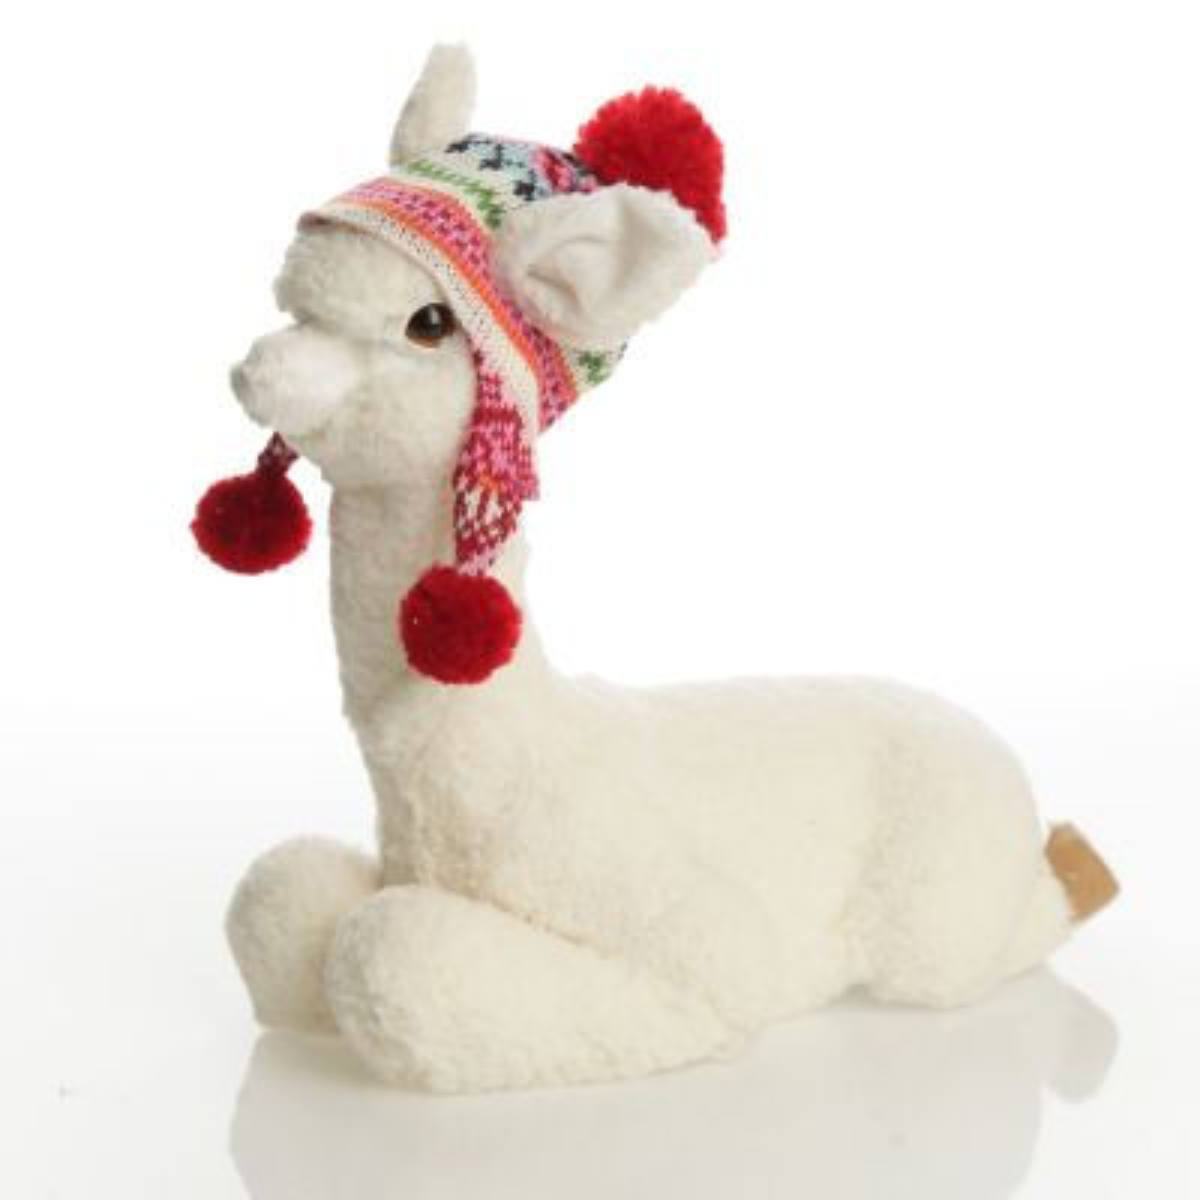 Fluffy White Llama with Hat - Sitting